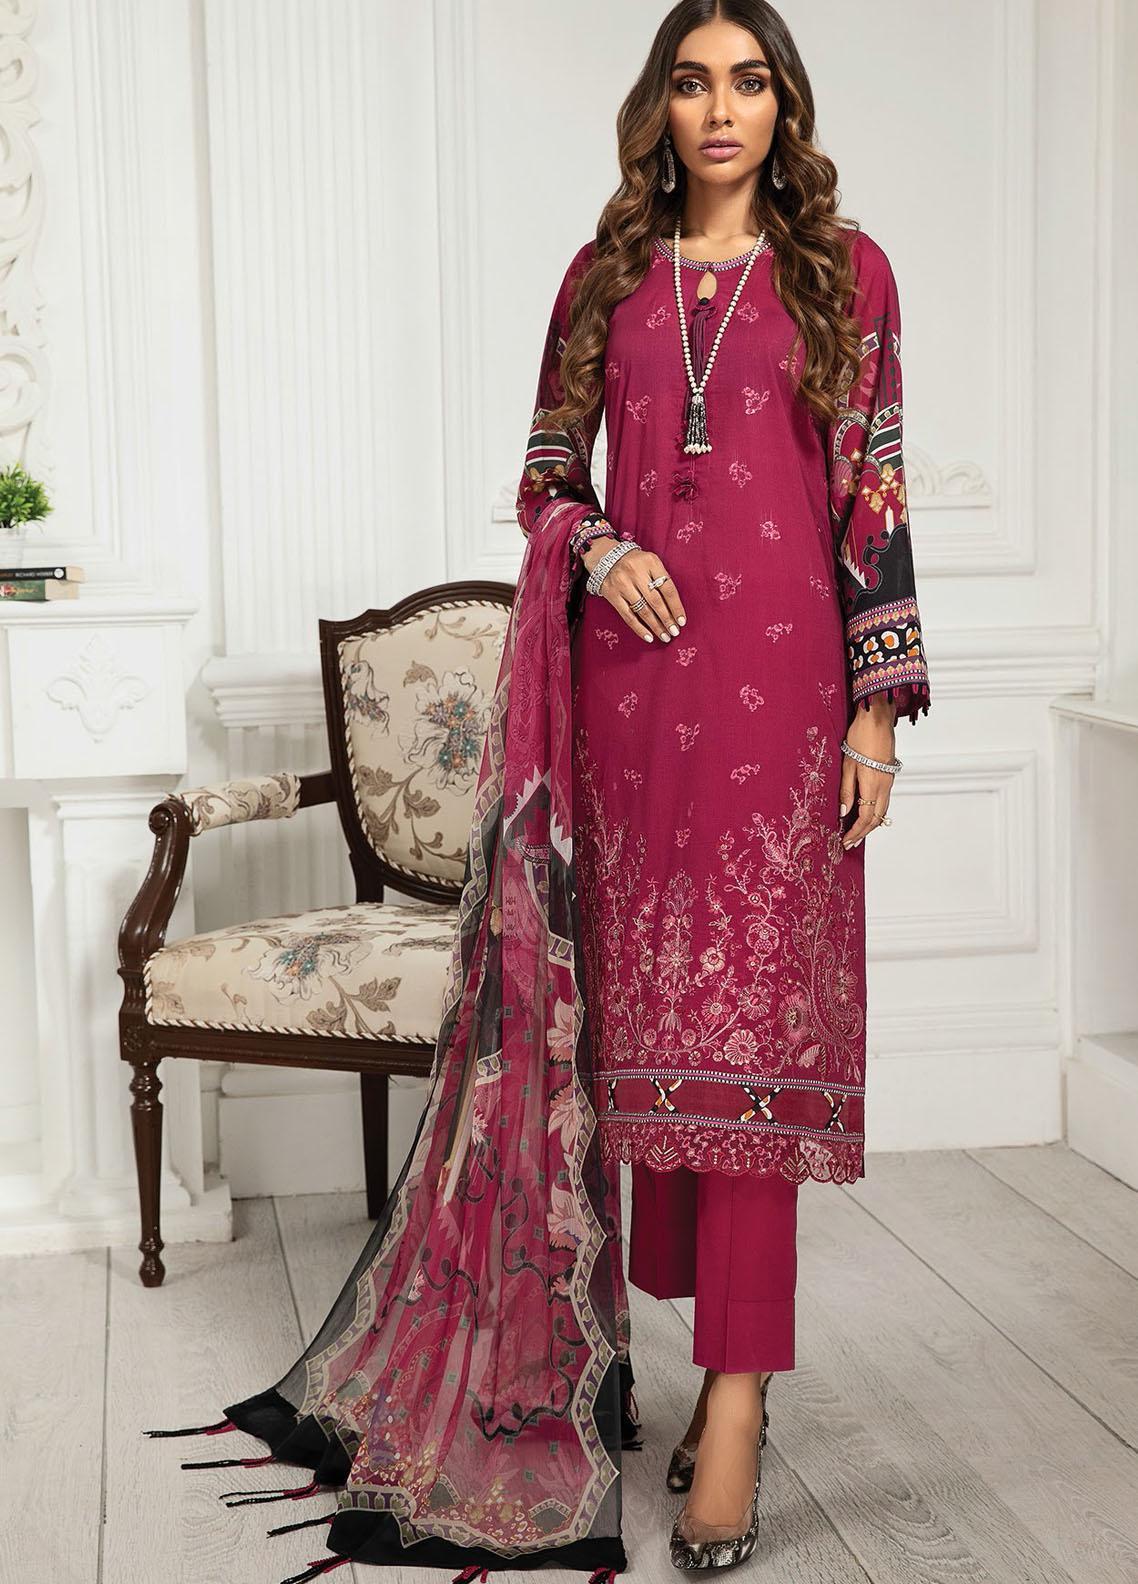 Farasha Embroidered Lawn Suits Unstitched 3 Piece FSH21-L3 06 Fuchsia Rose - Festive Collection